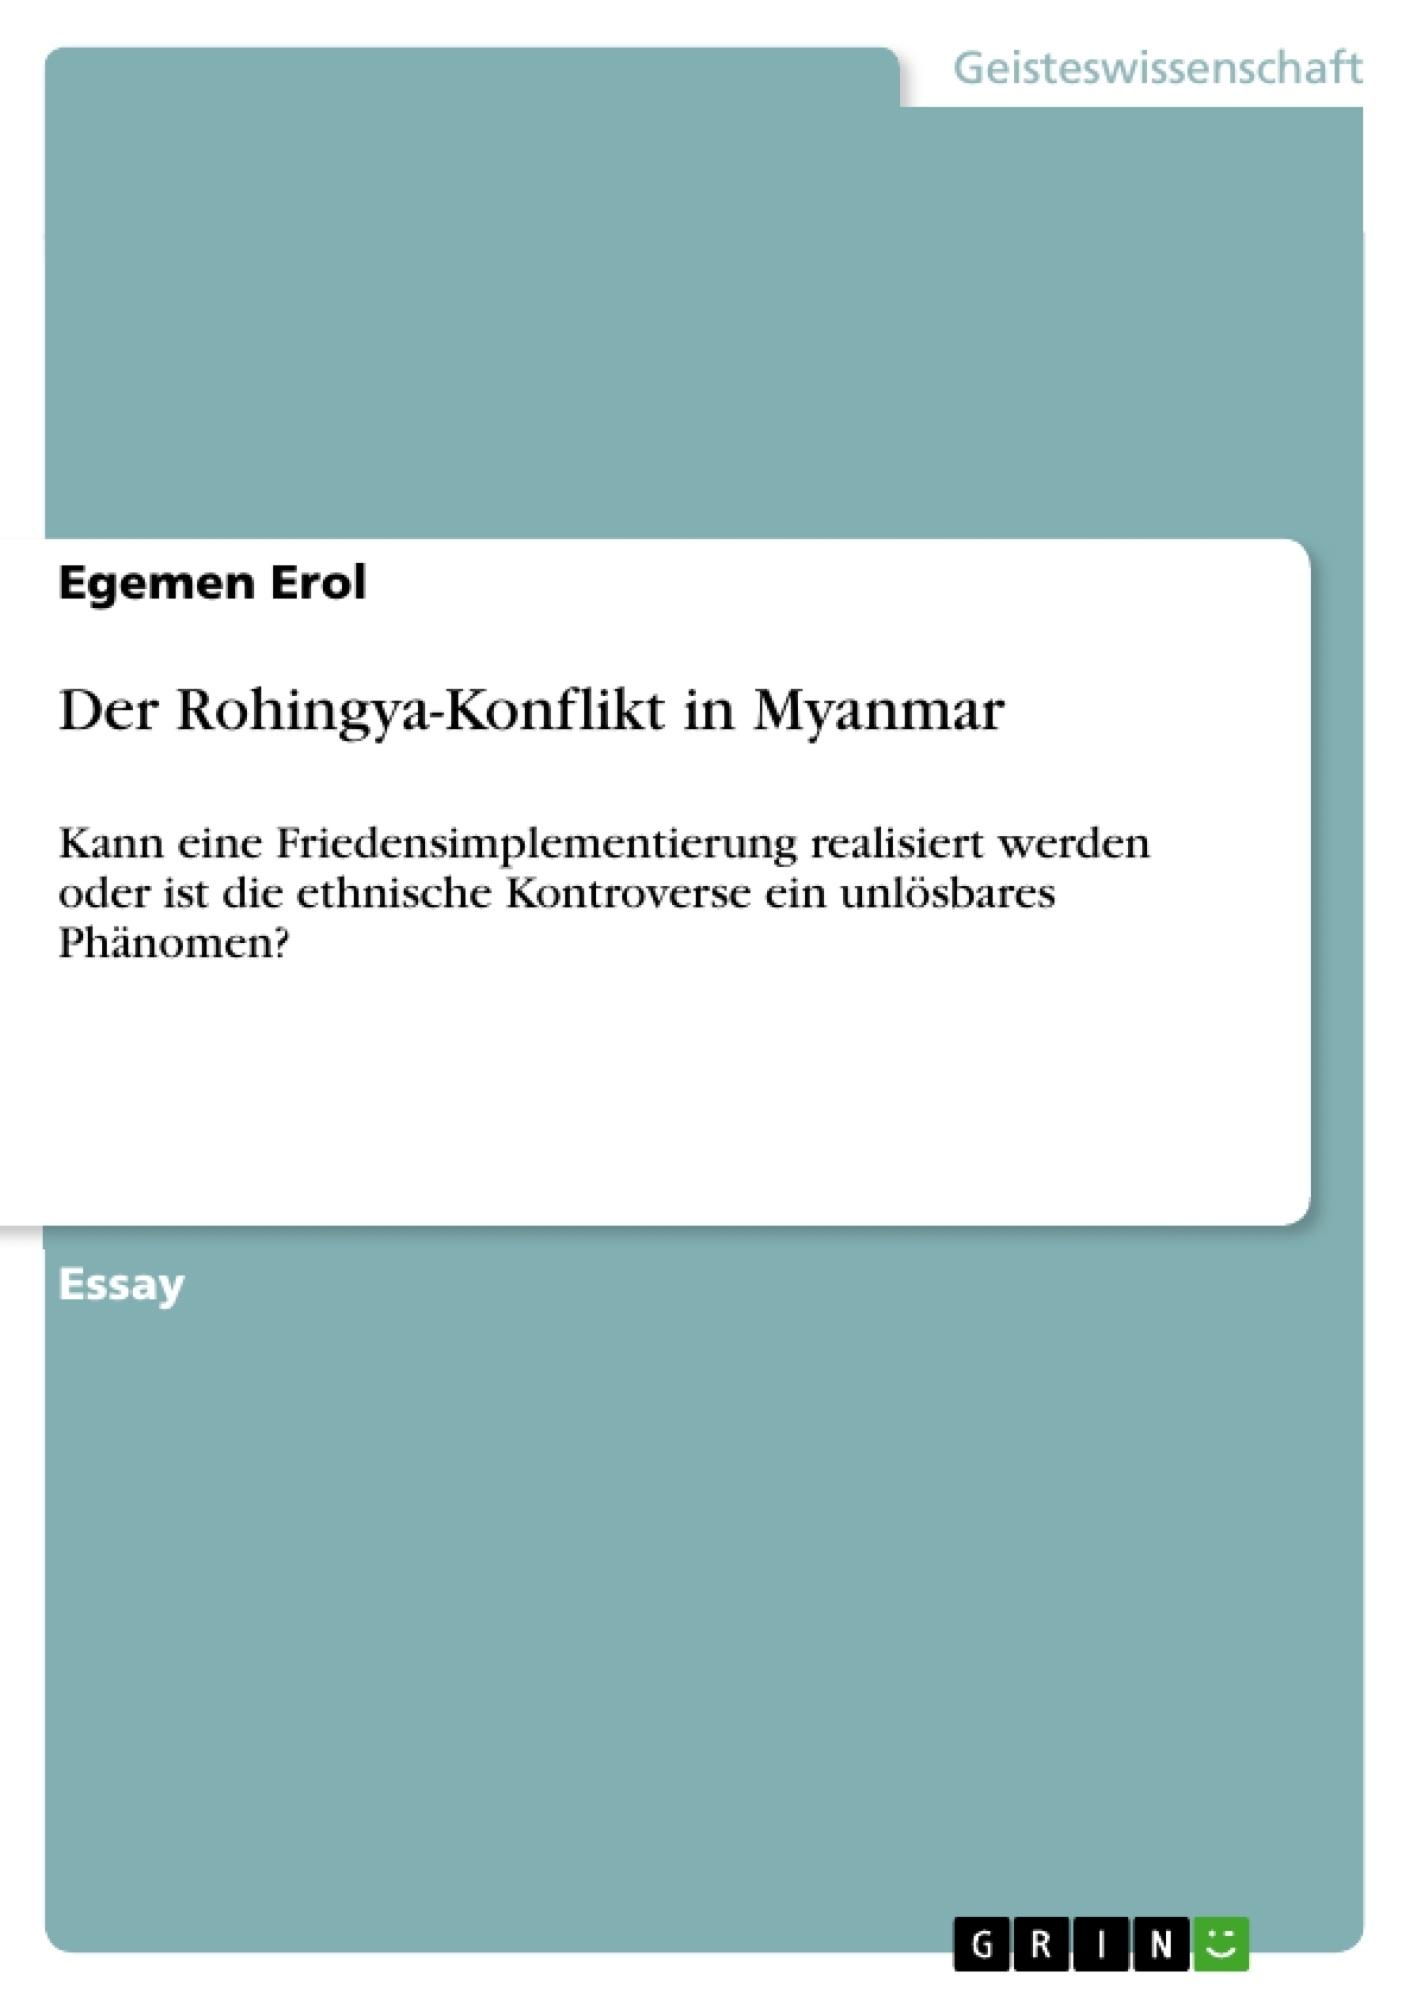 Titel: Der Rohingya-Konflikt in Myanmar